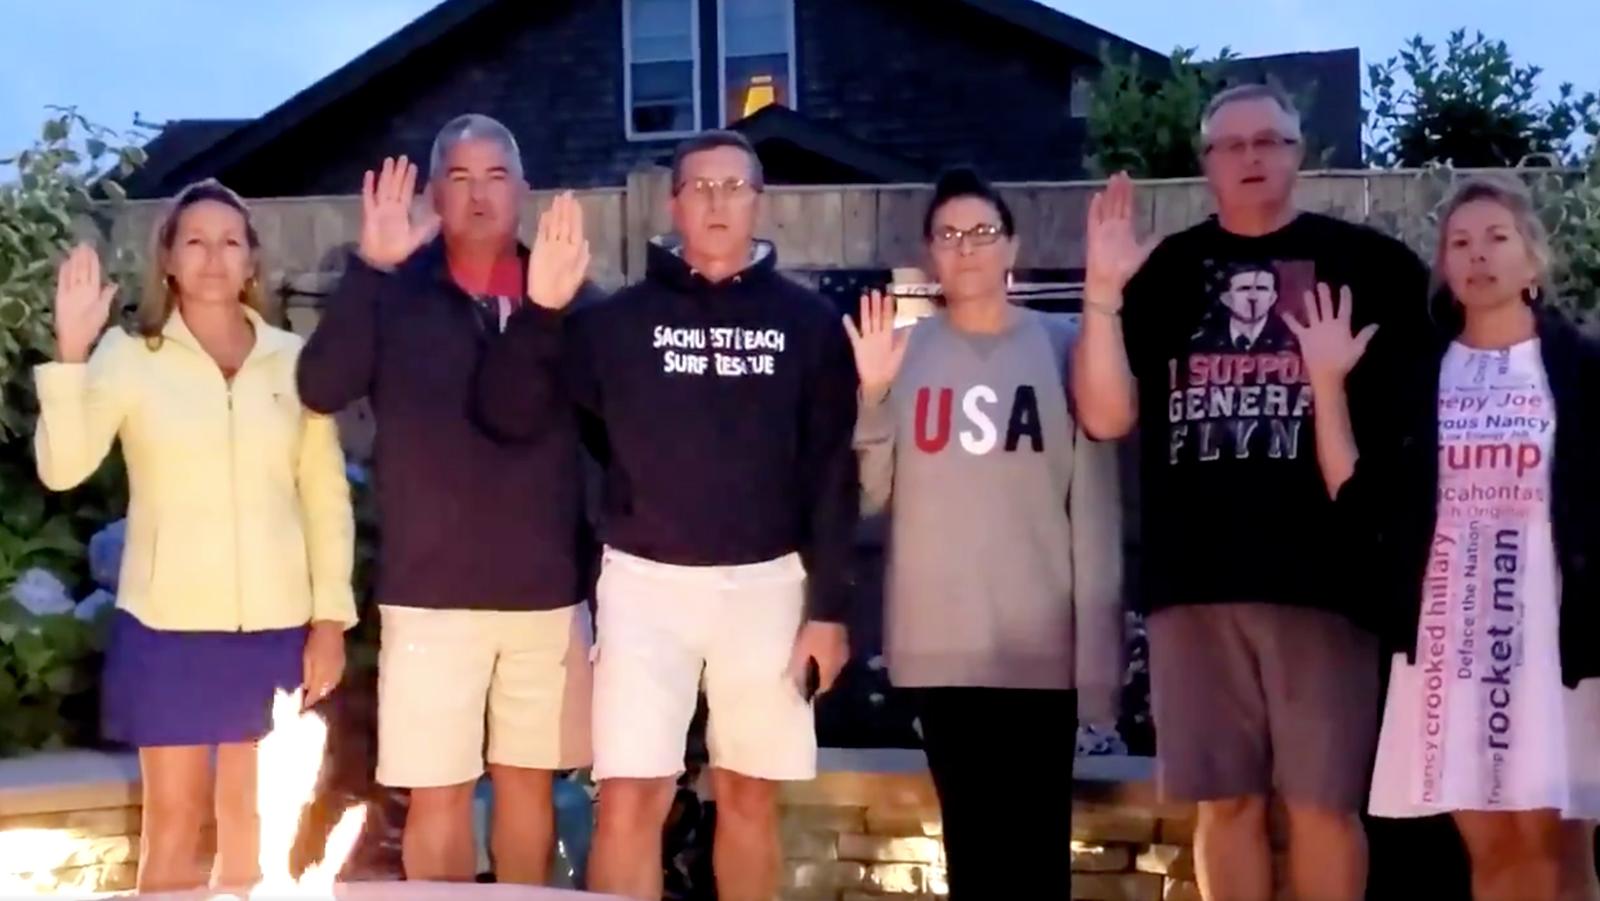 Michael Flynn posts video featuring QAnon slogans